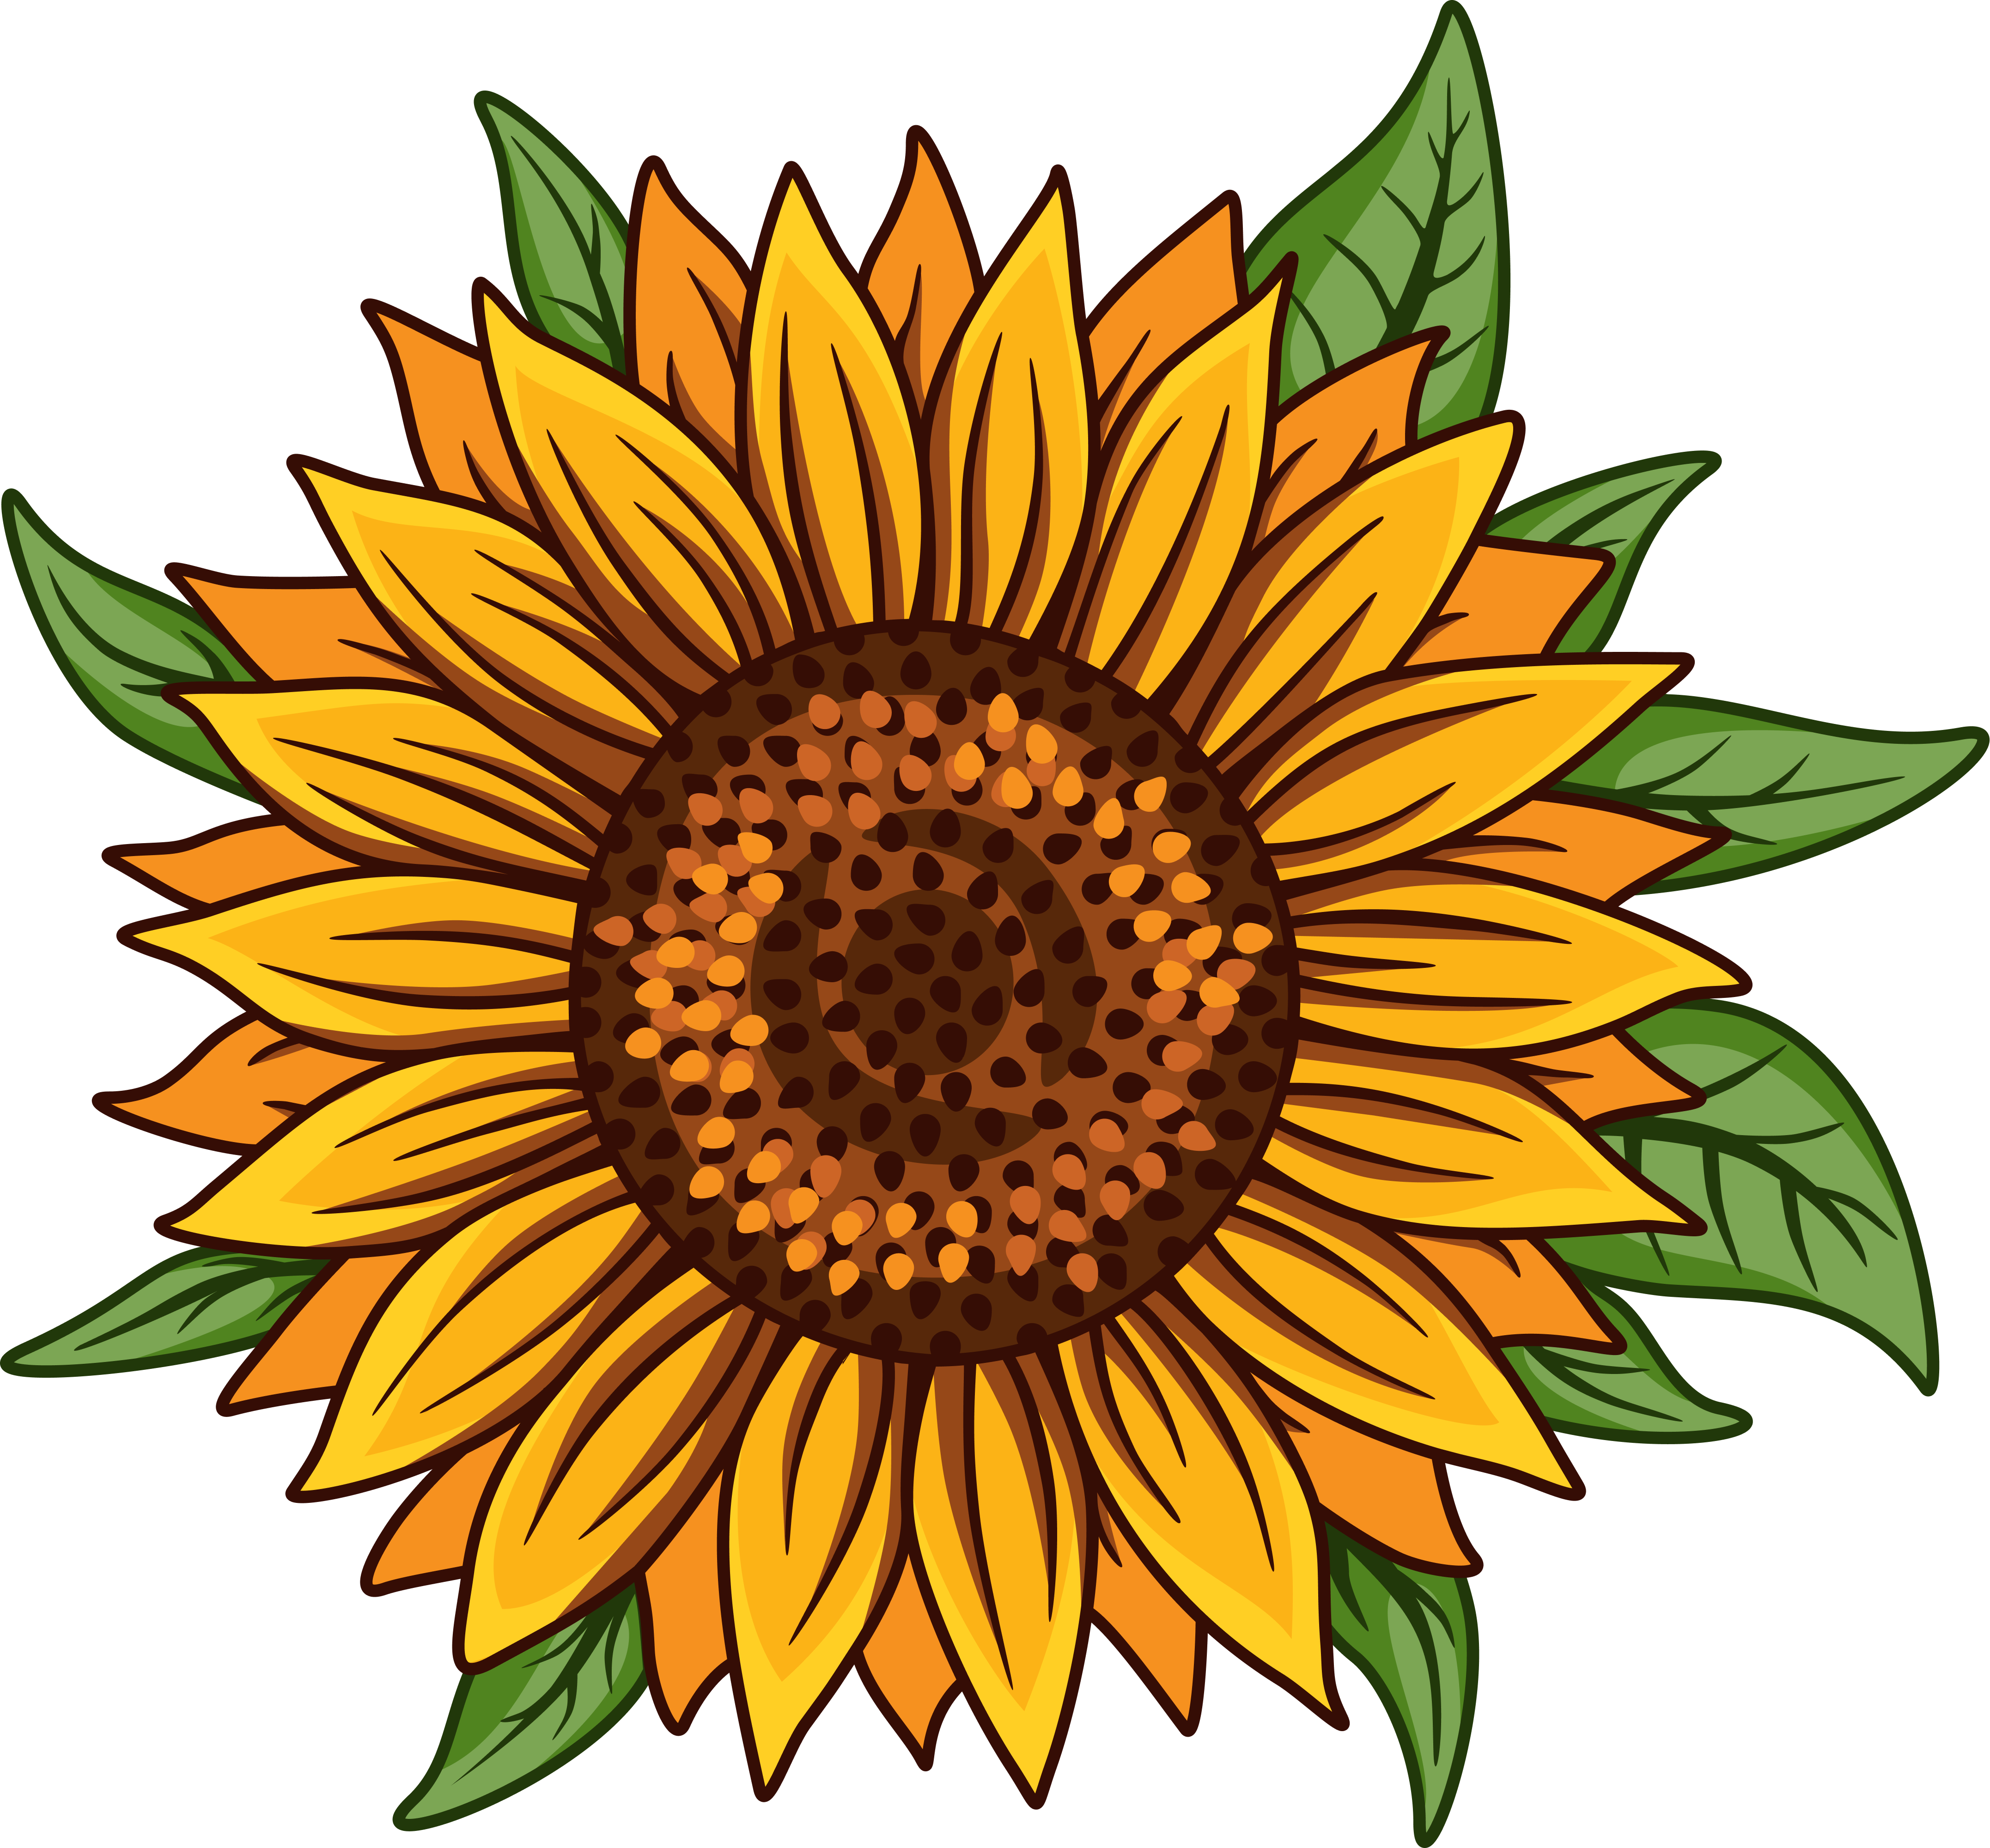 Sunflower Svg Digital Download Sunflower Png White Sunflower Clipart Floral Flower Svg Files For Cricut In 2021 Sunflower Clipart Sunflower Png Sunflower Stencil